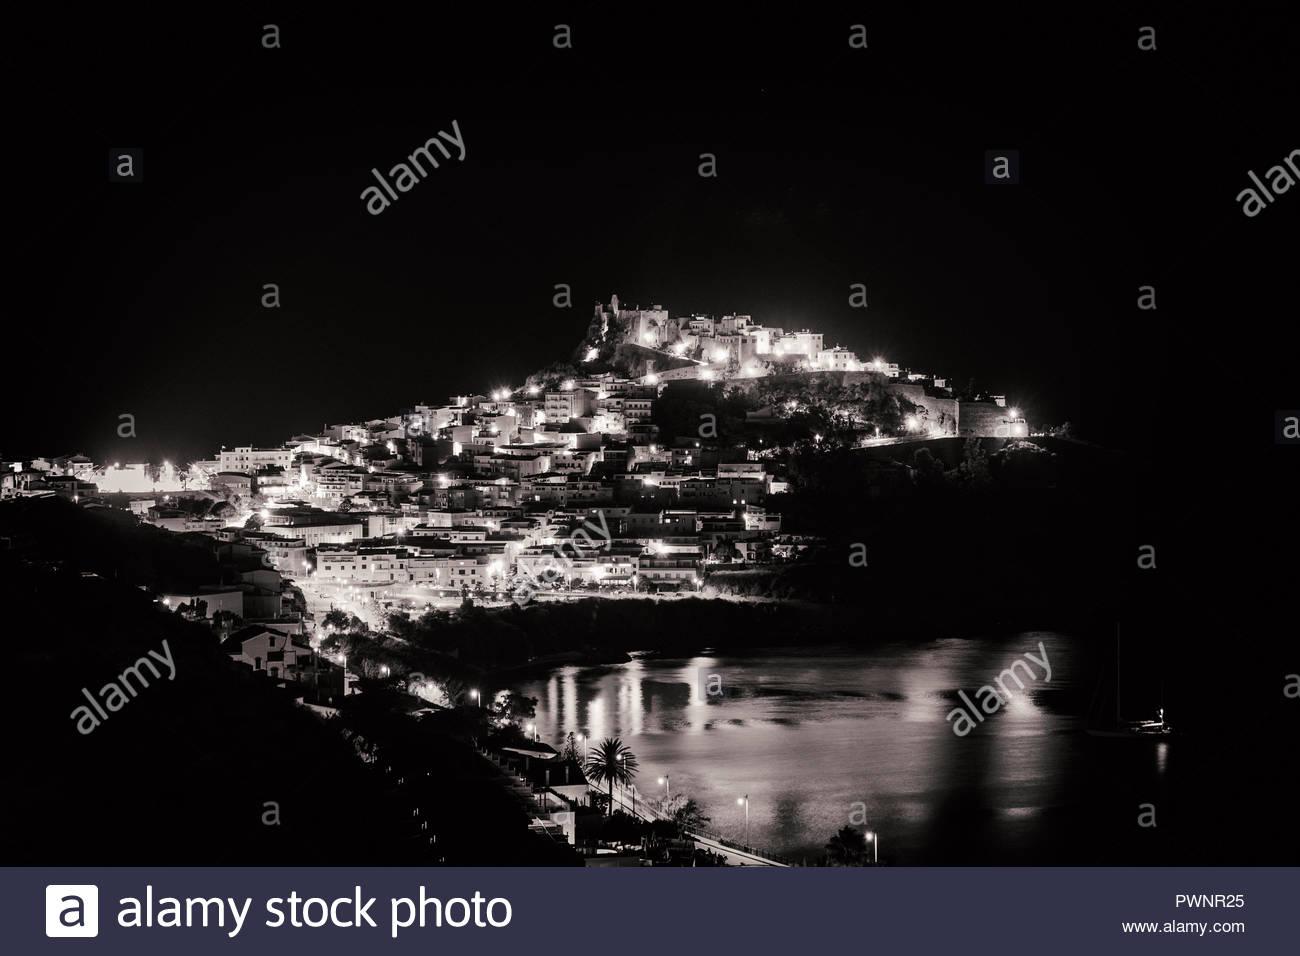 Castelsardo bei Nacht, Sardinien, Italien - Stock Image